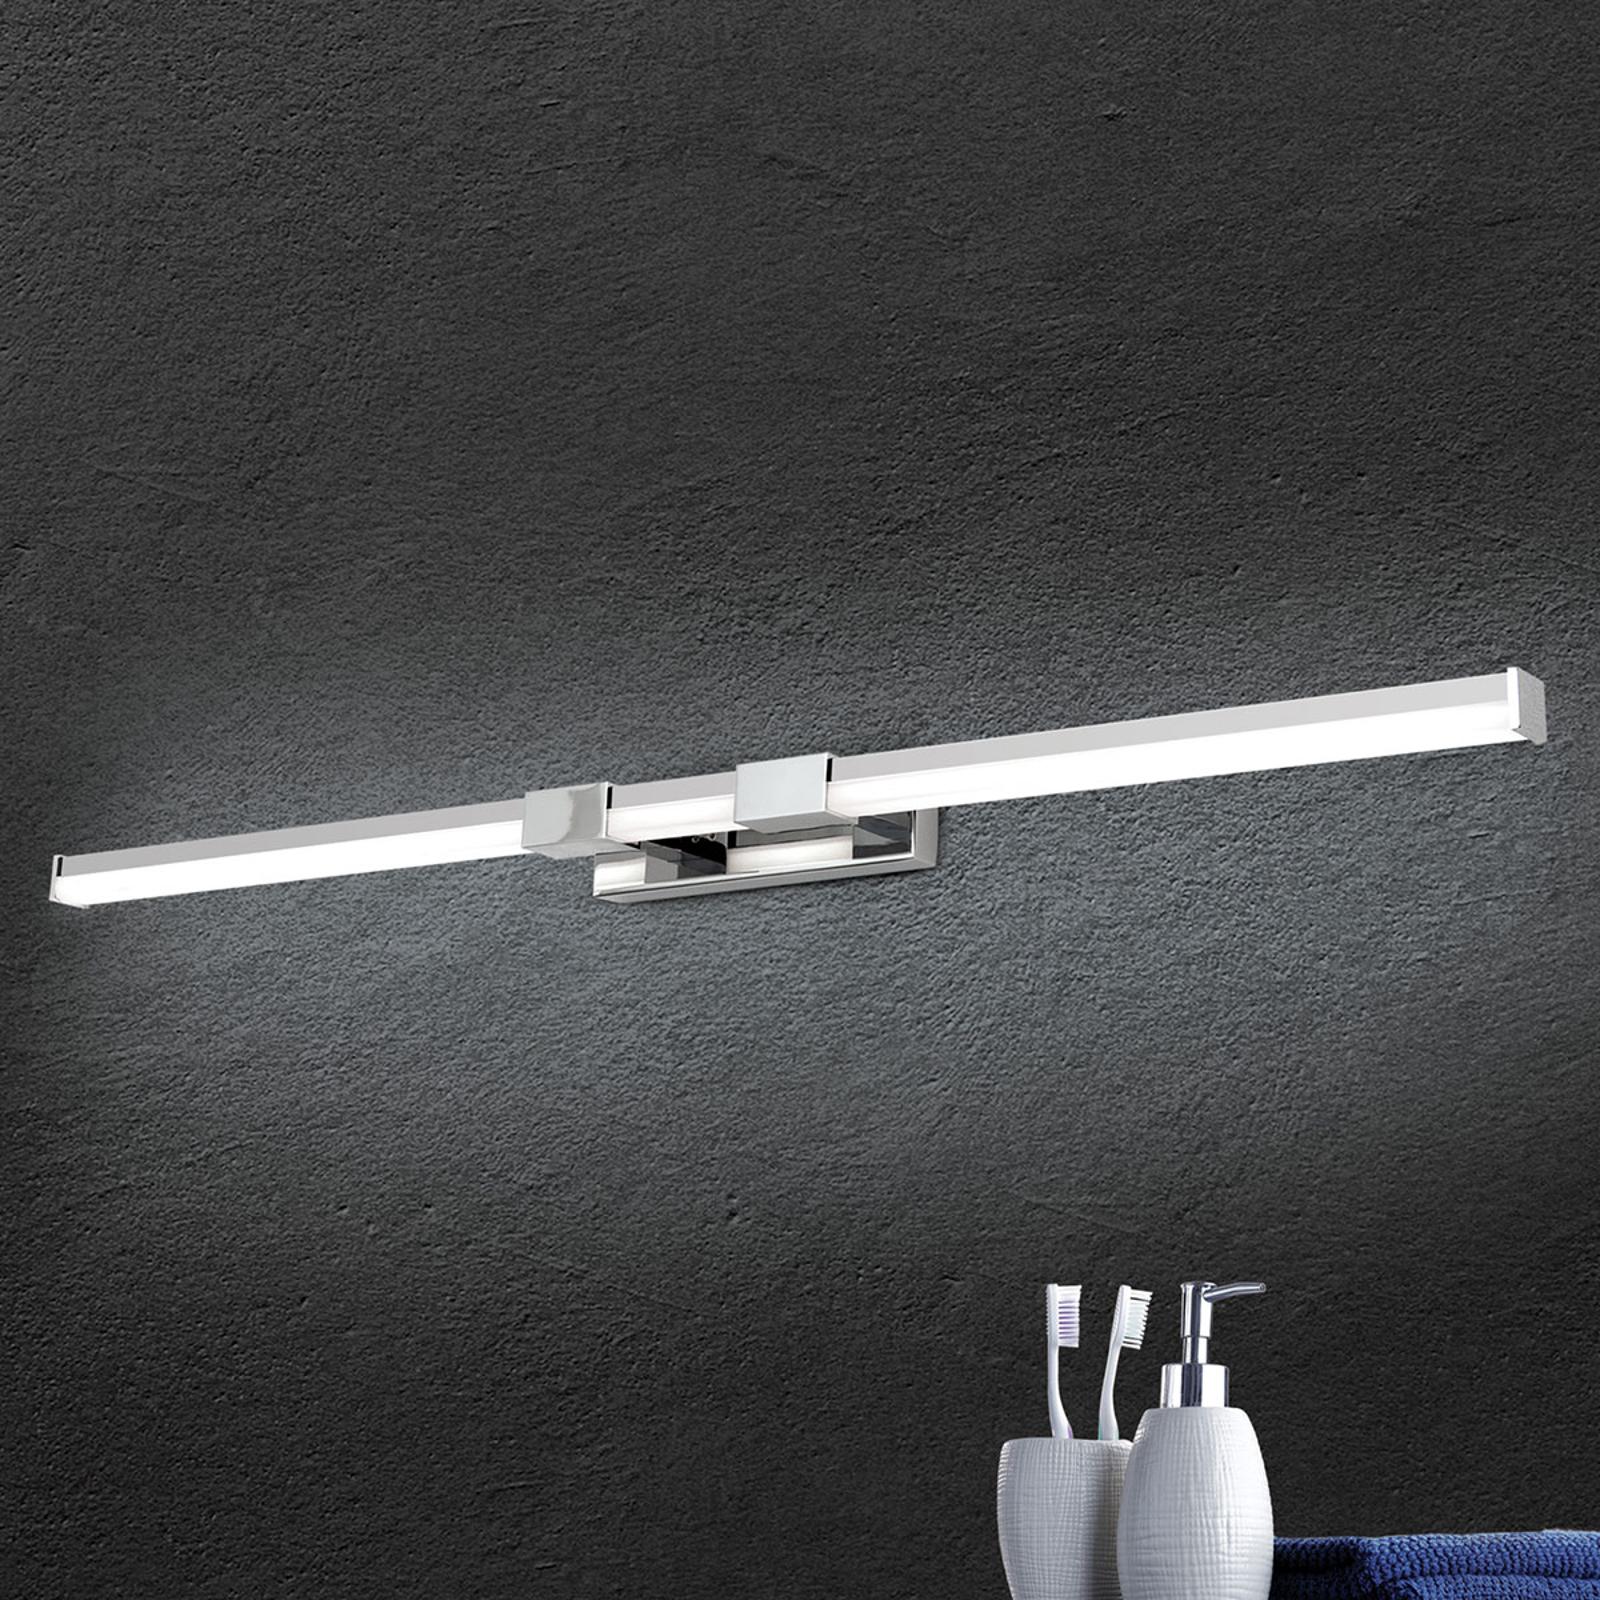 Kylpyhuoneen peililamppu Argo, LED 75,5 cm